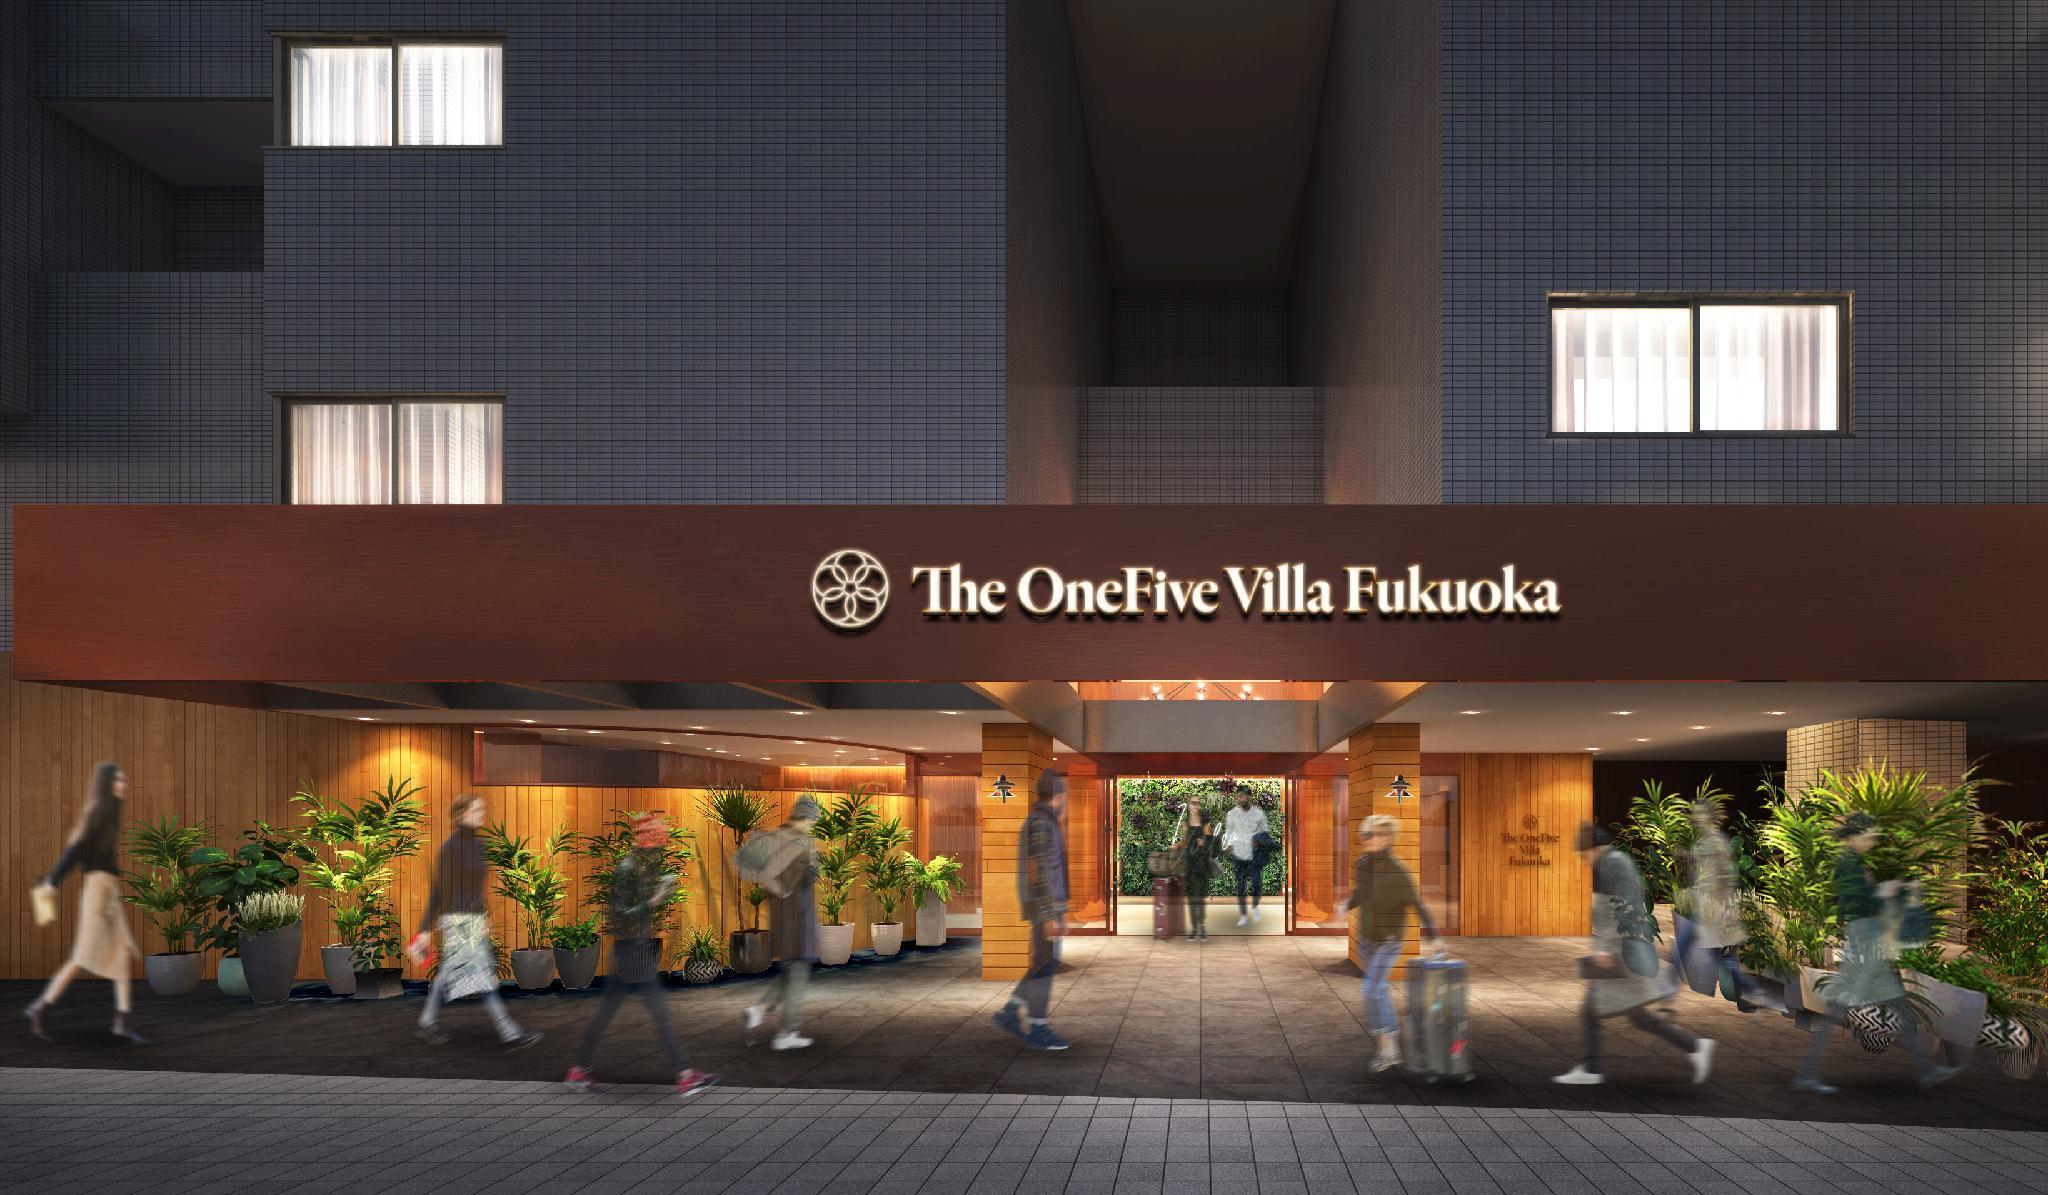 The OneFive Villa Fukuoka